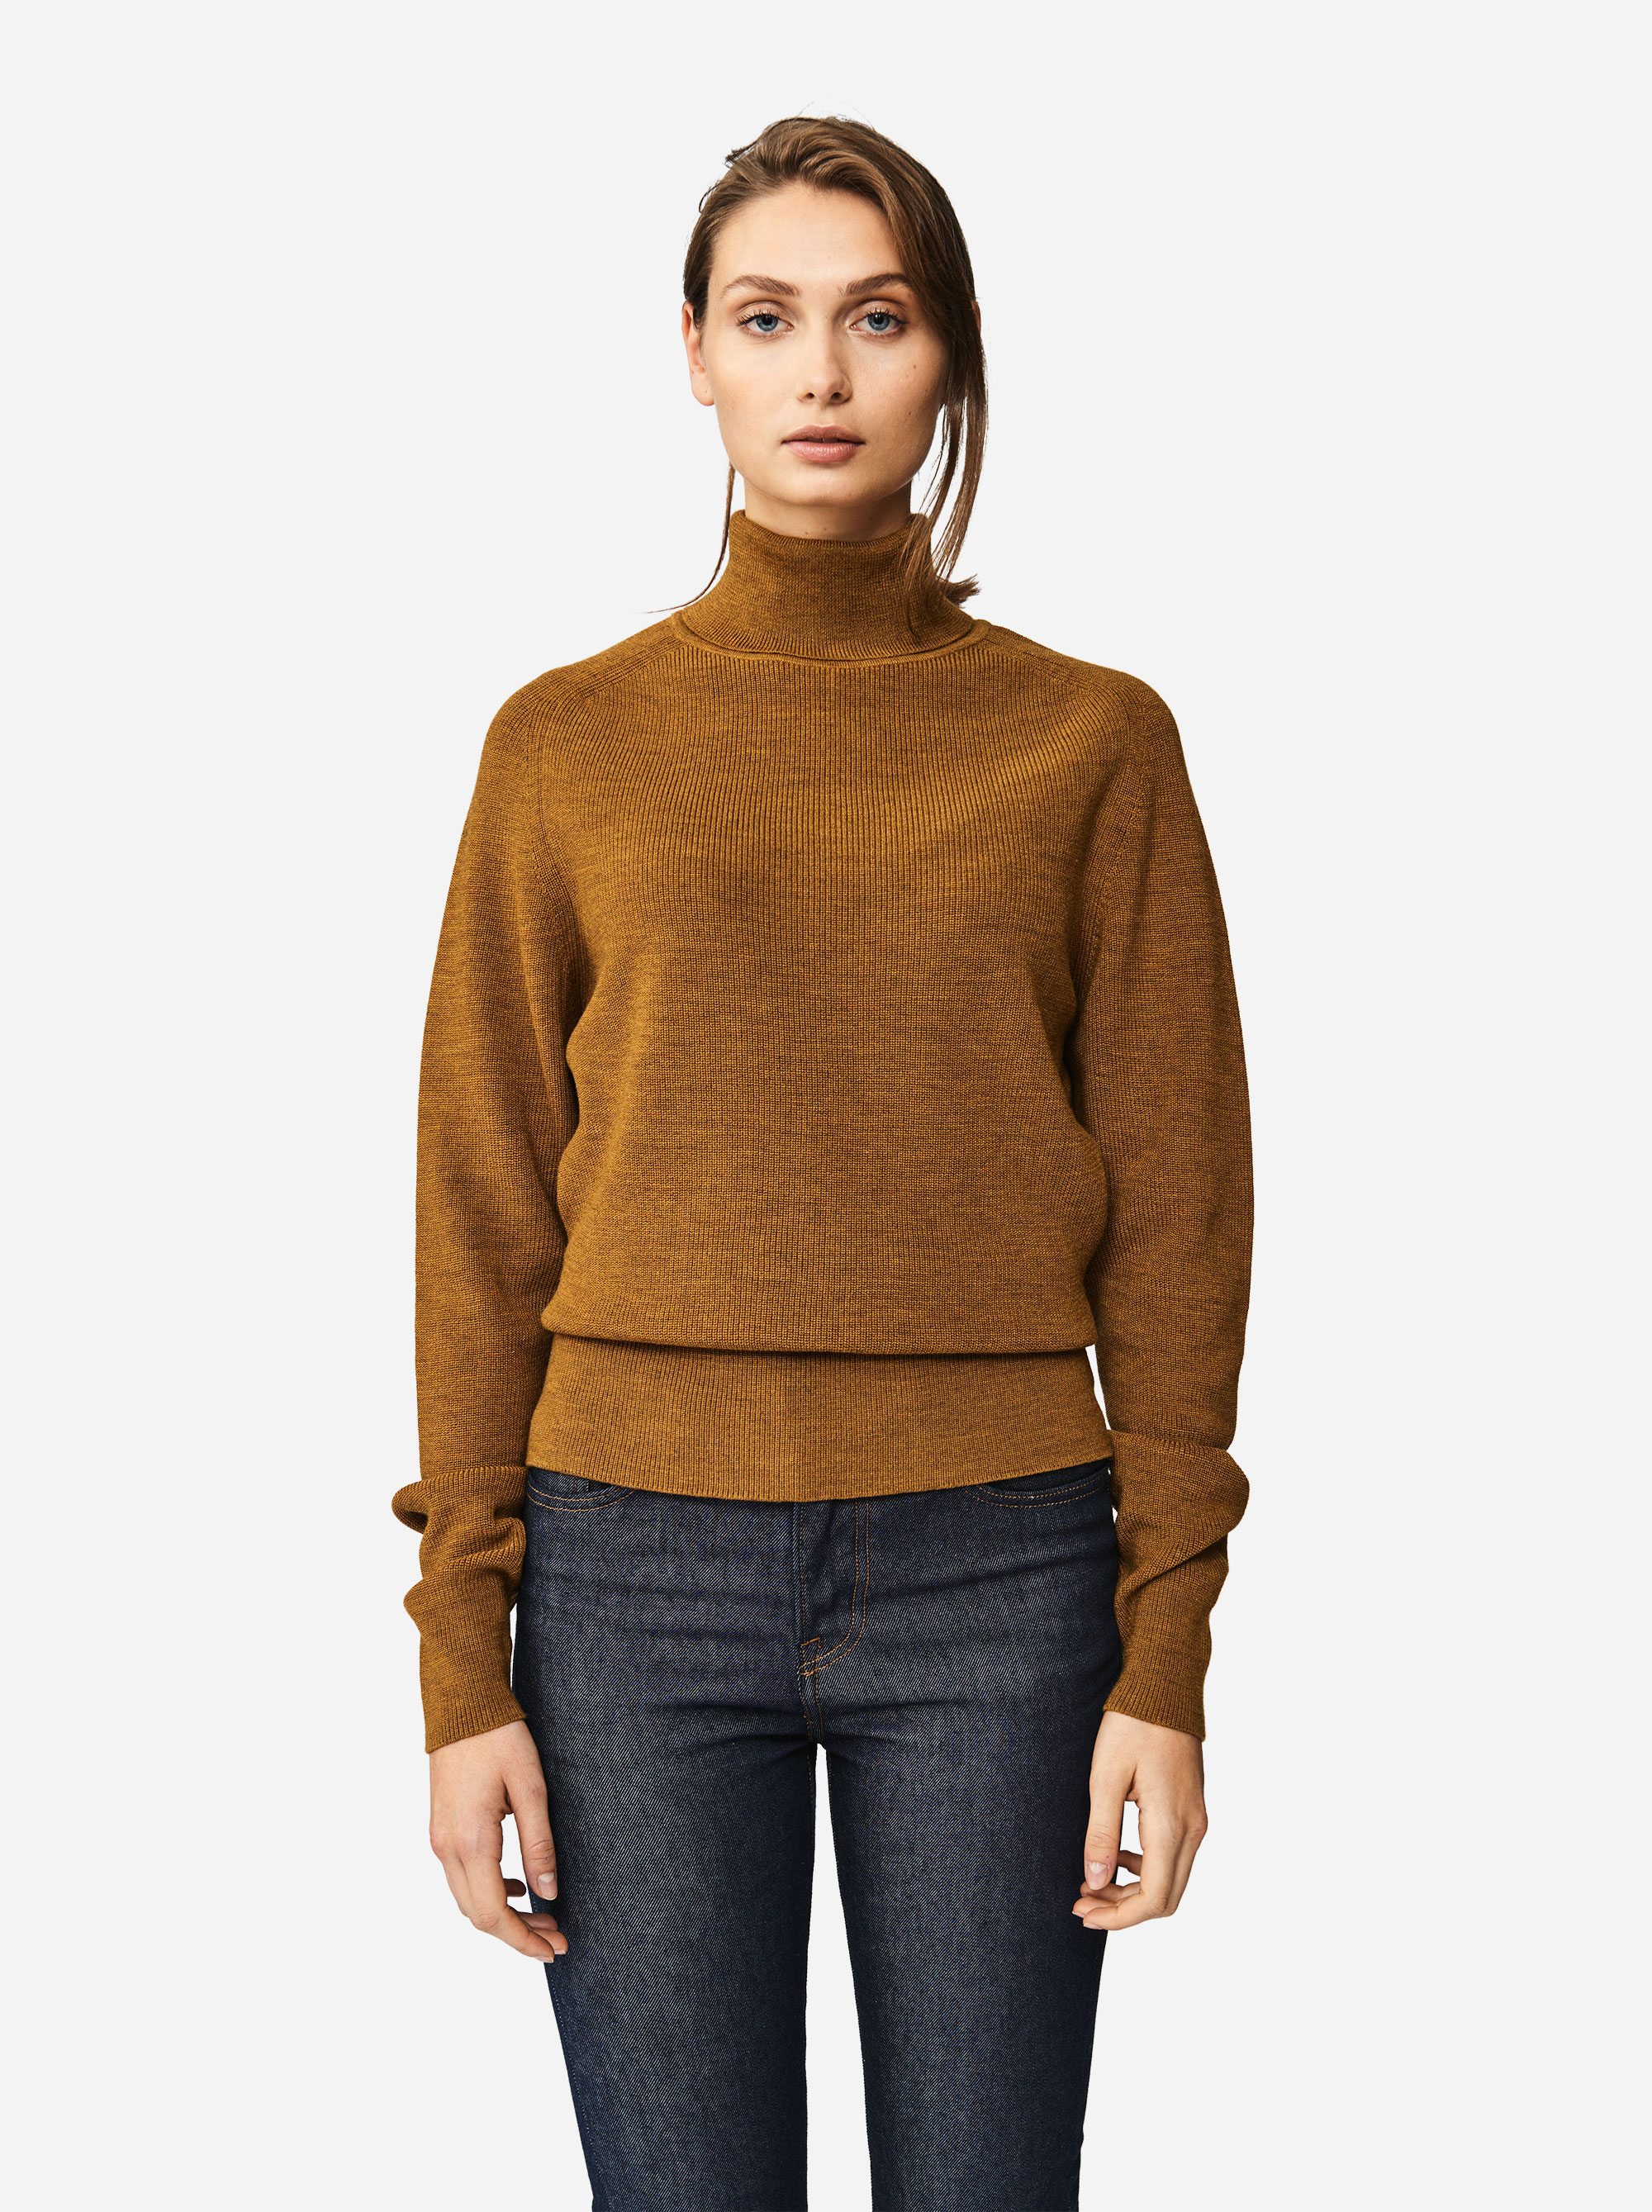 Teym - Turtleneck - The Merino Sweater - Women - Camel - 3